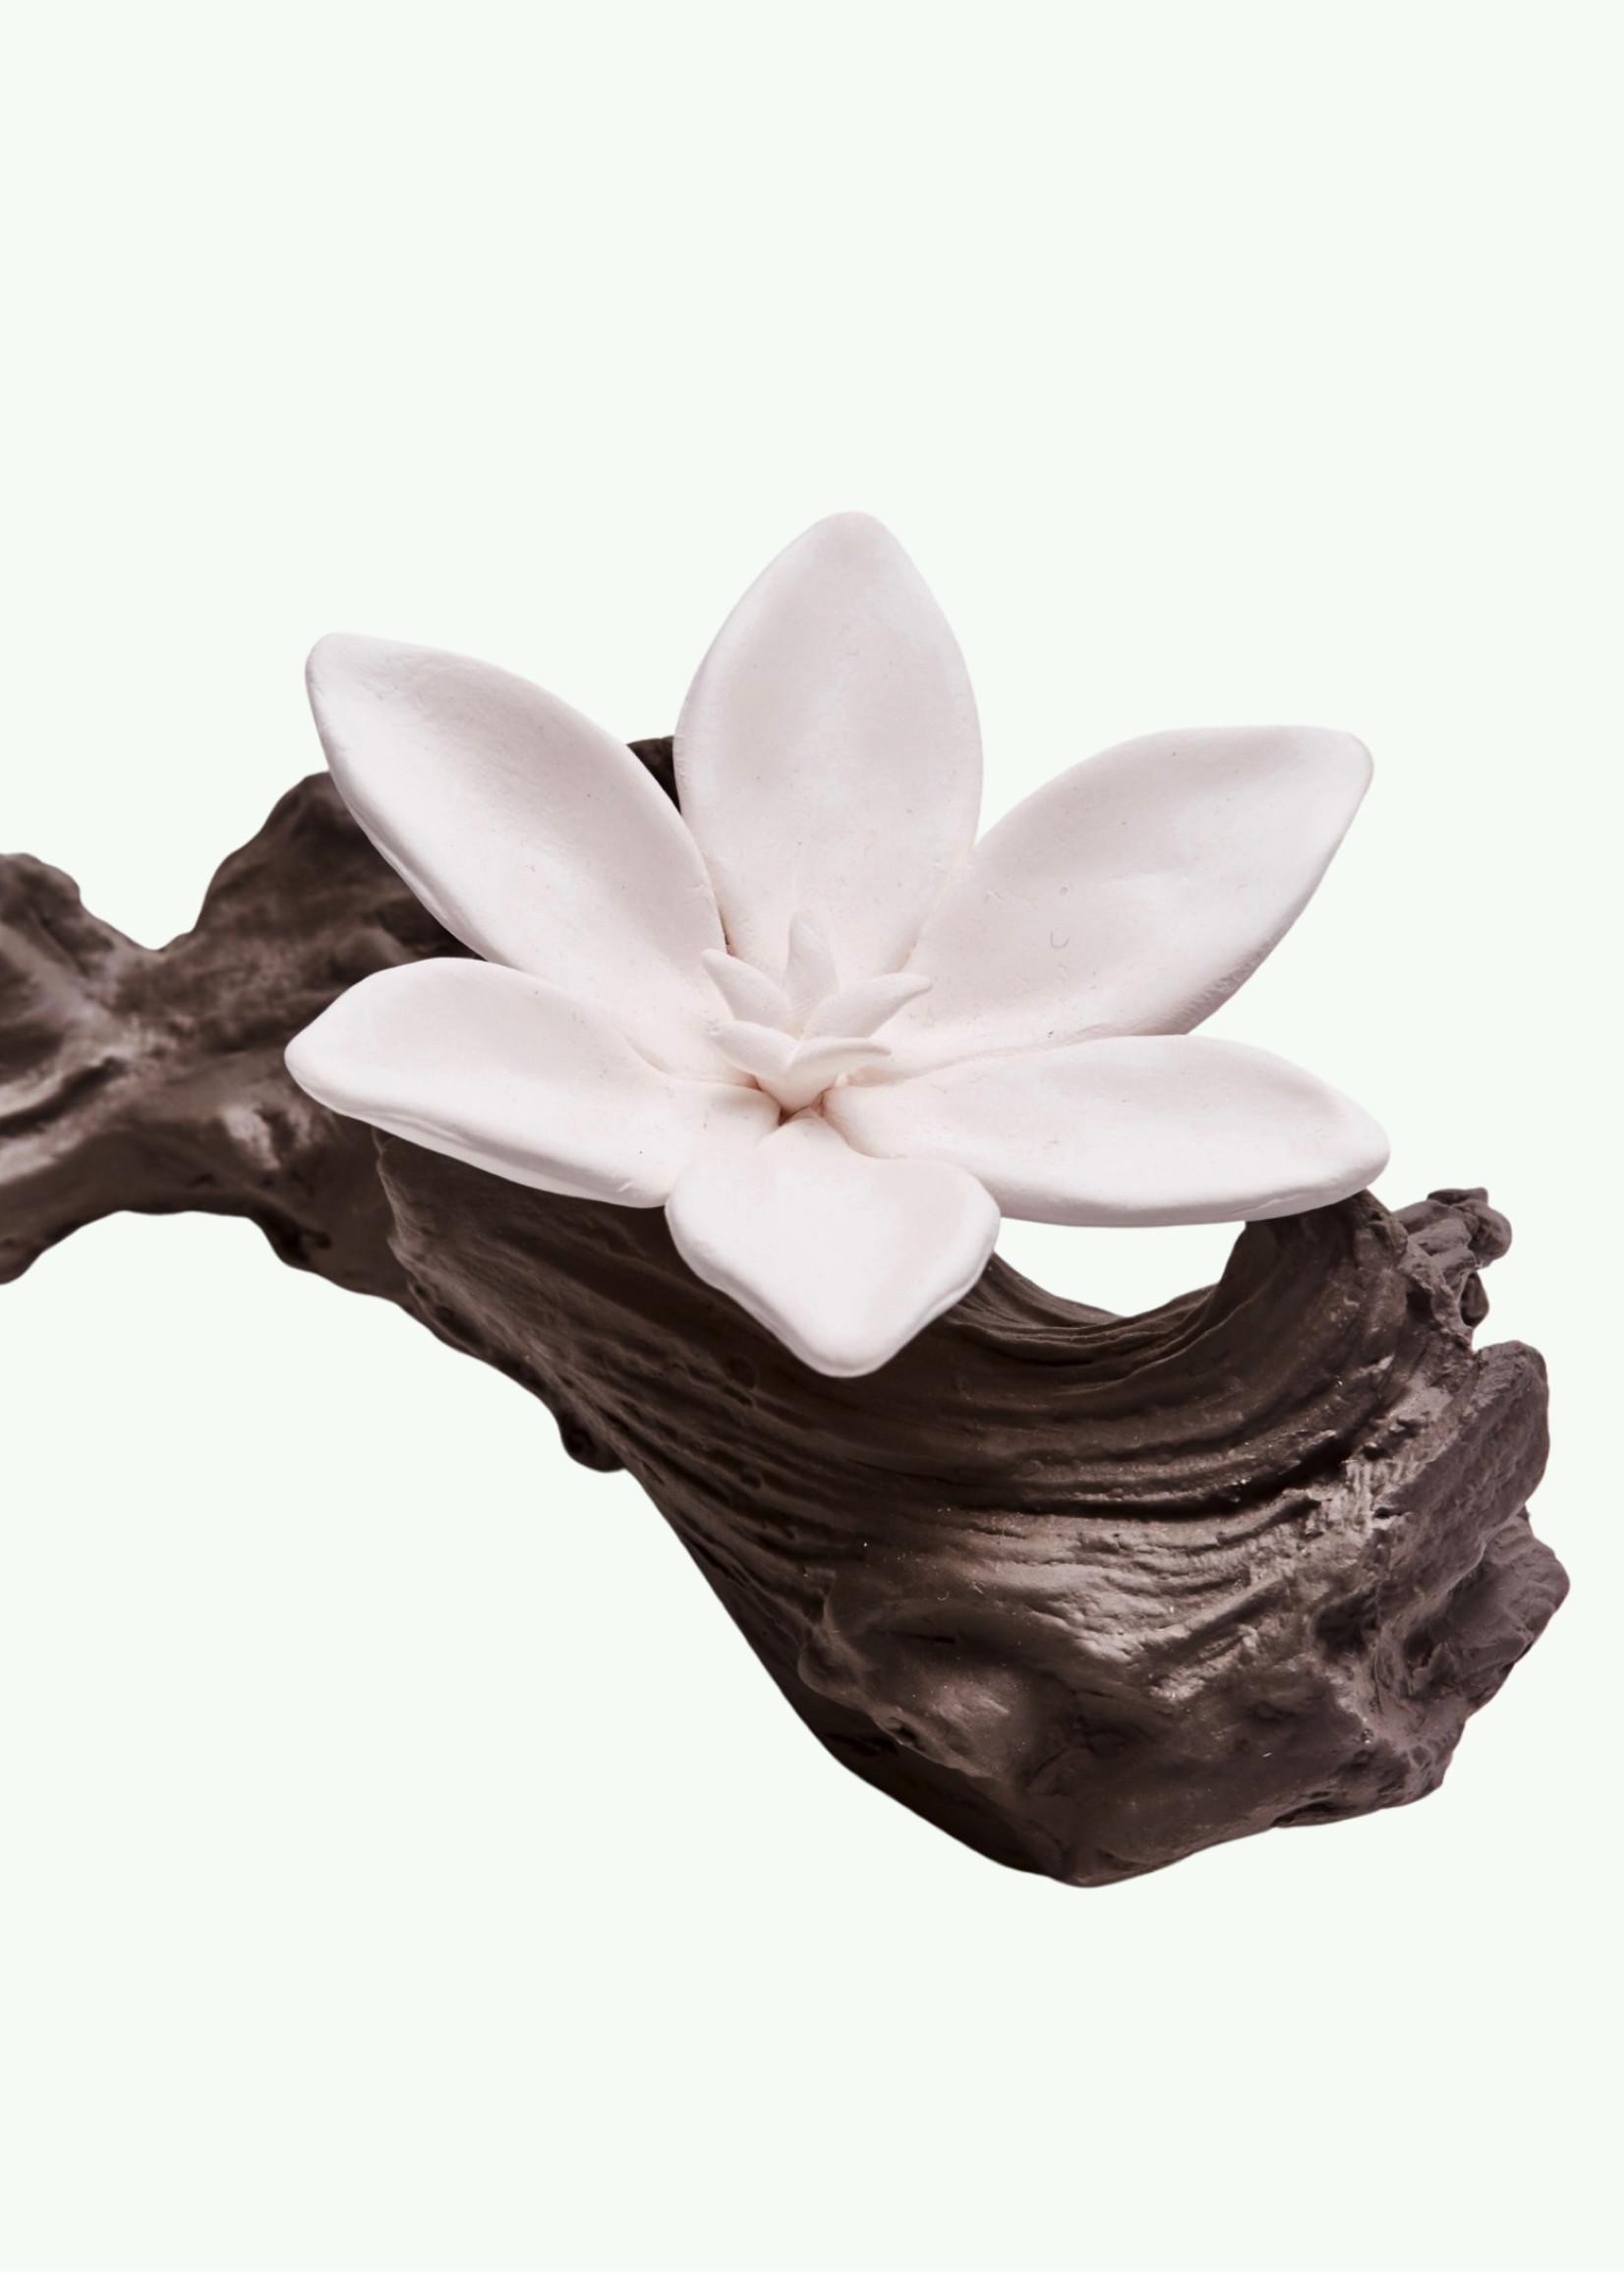 Anoq Anoq - Sumba - Perfume diffuser